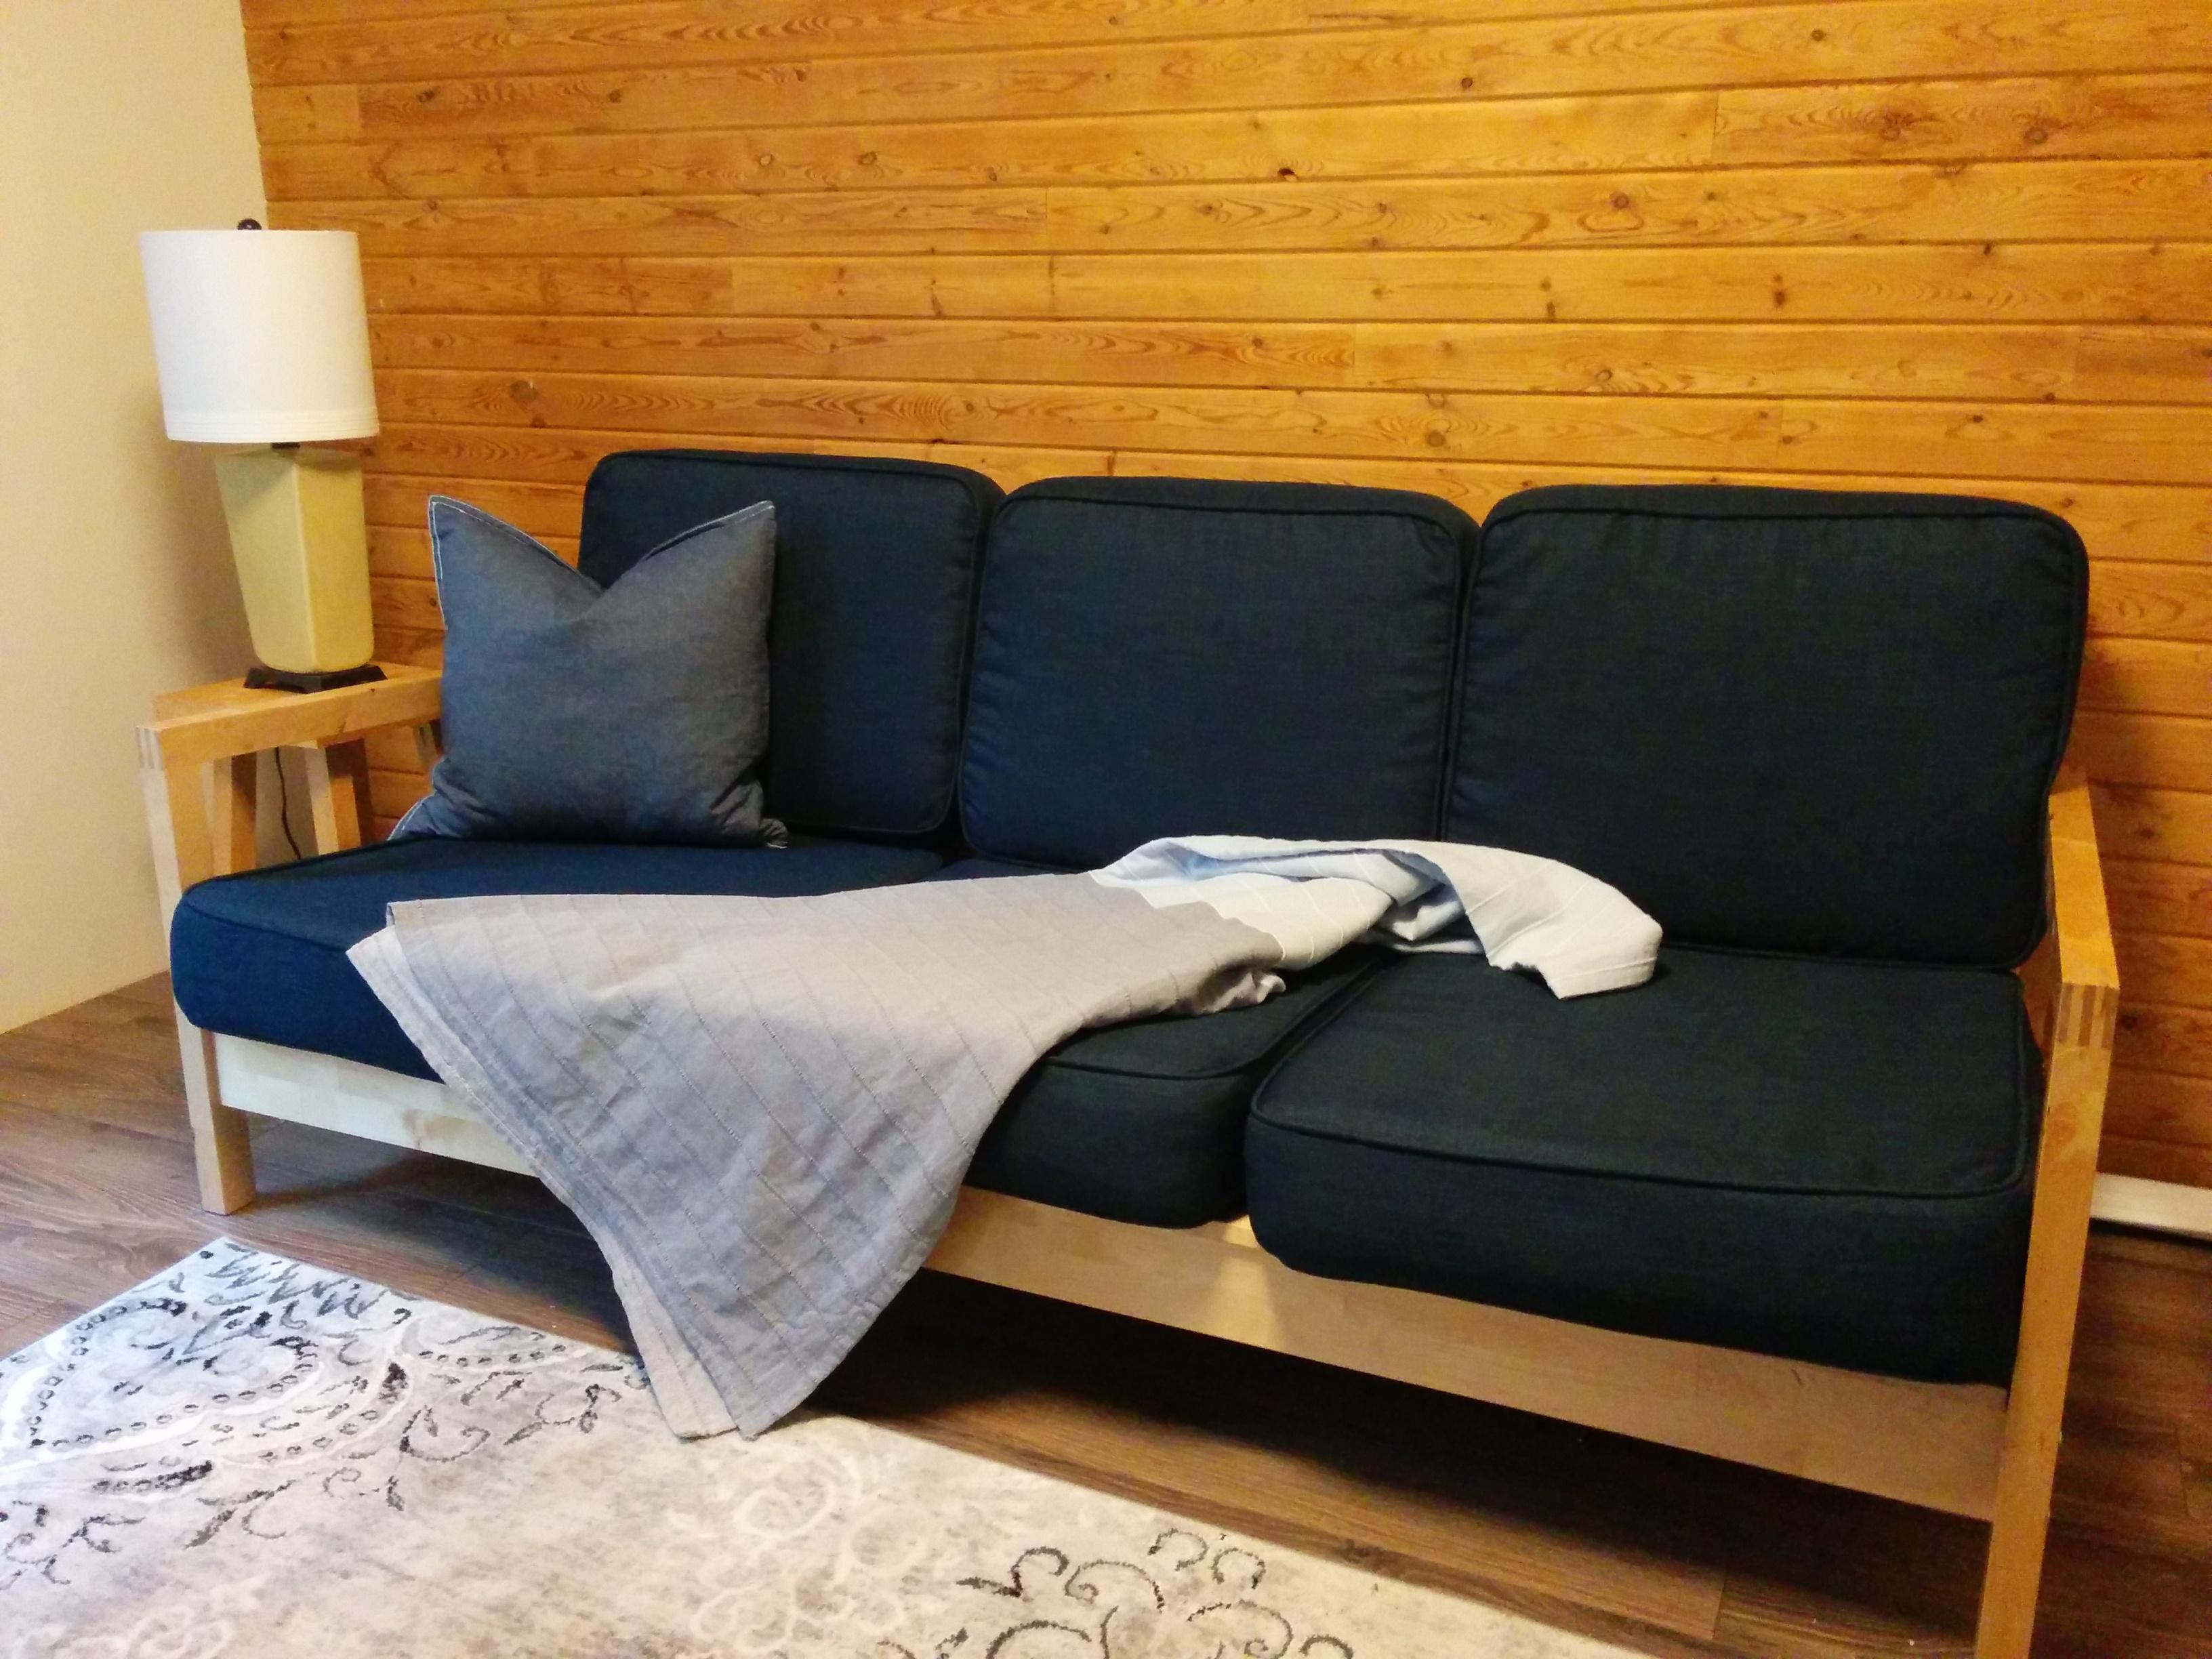 Lillberg de IKEA en Funda Azul Marino